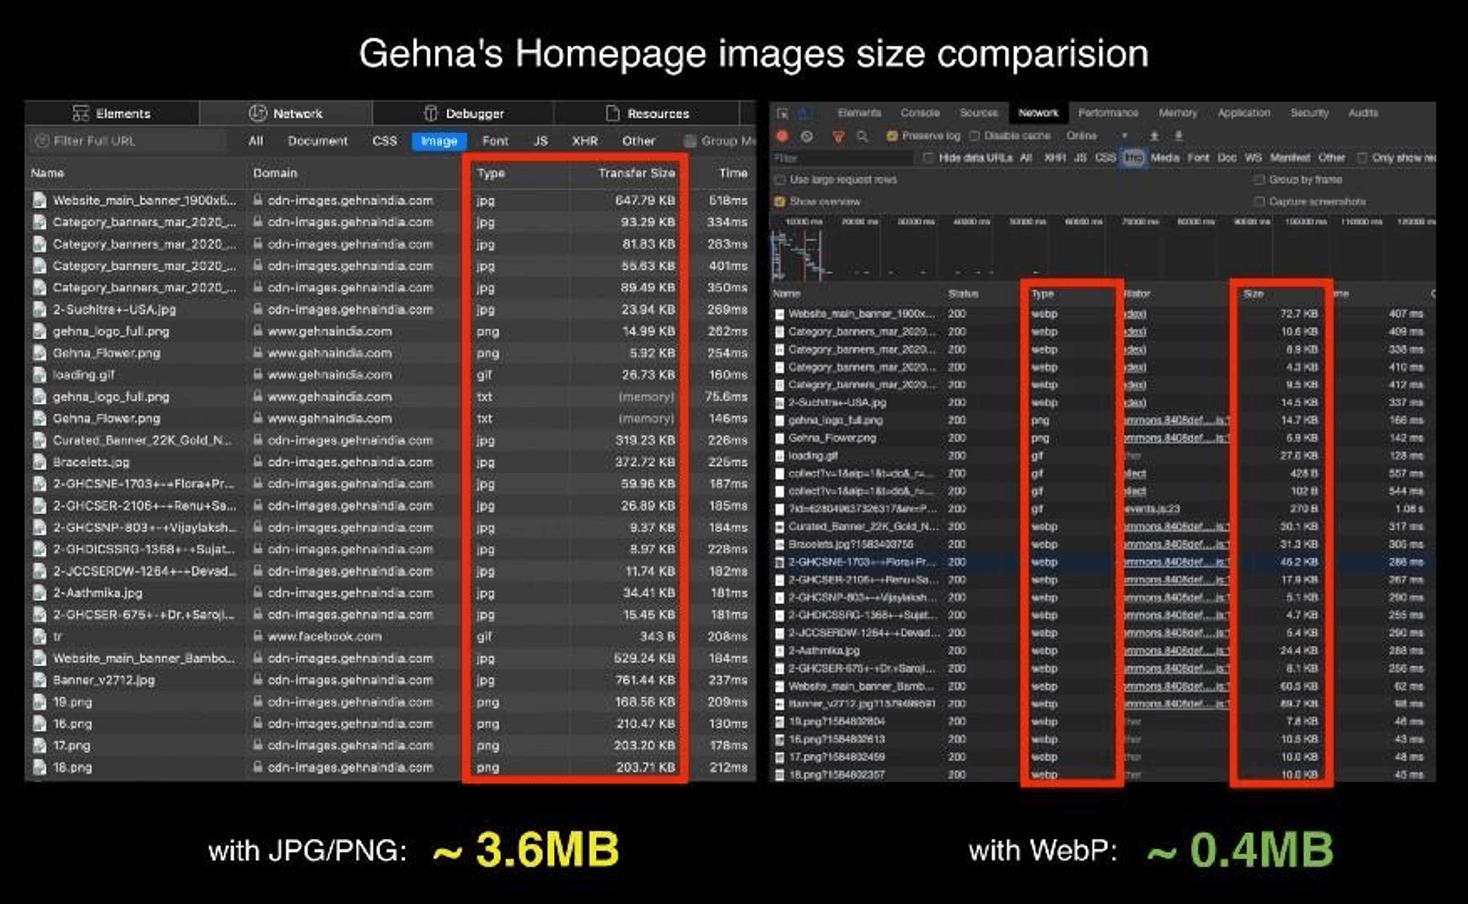 Gehna's homepage image size comparison